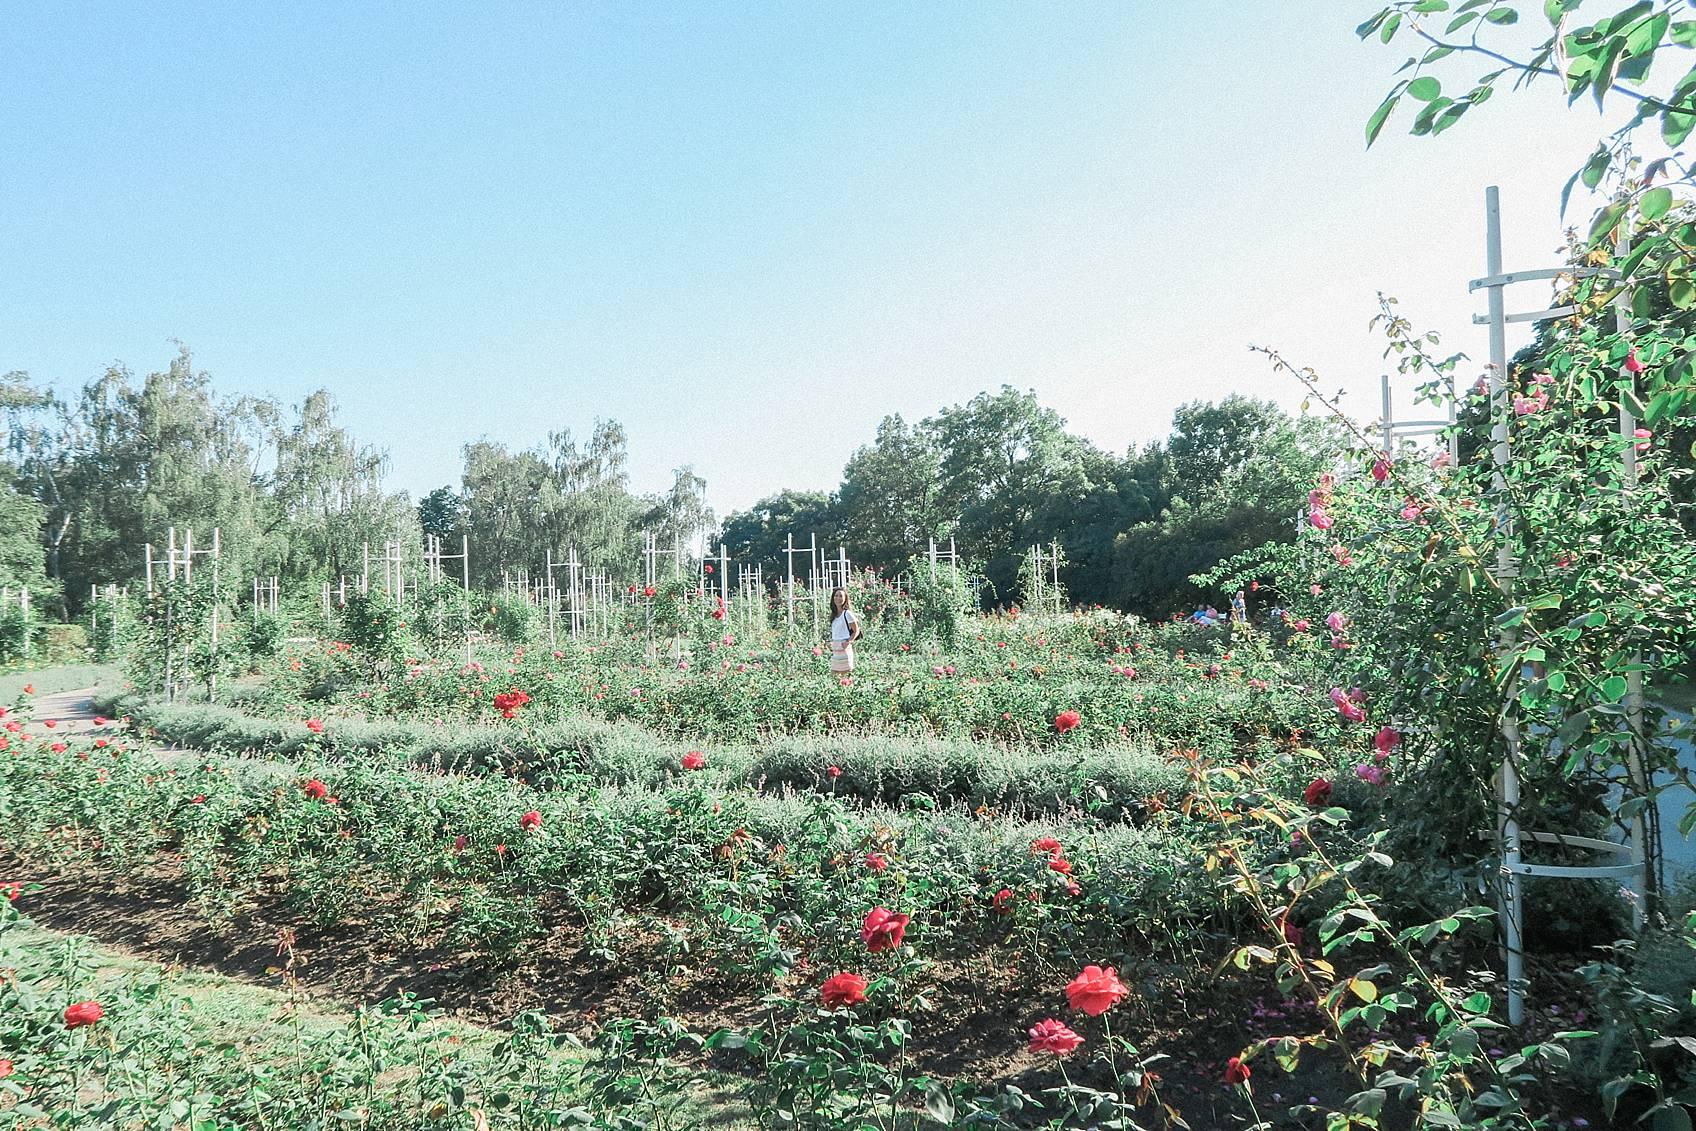 photo guide to Prague: rose garden at top of Prague, Czech Republic